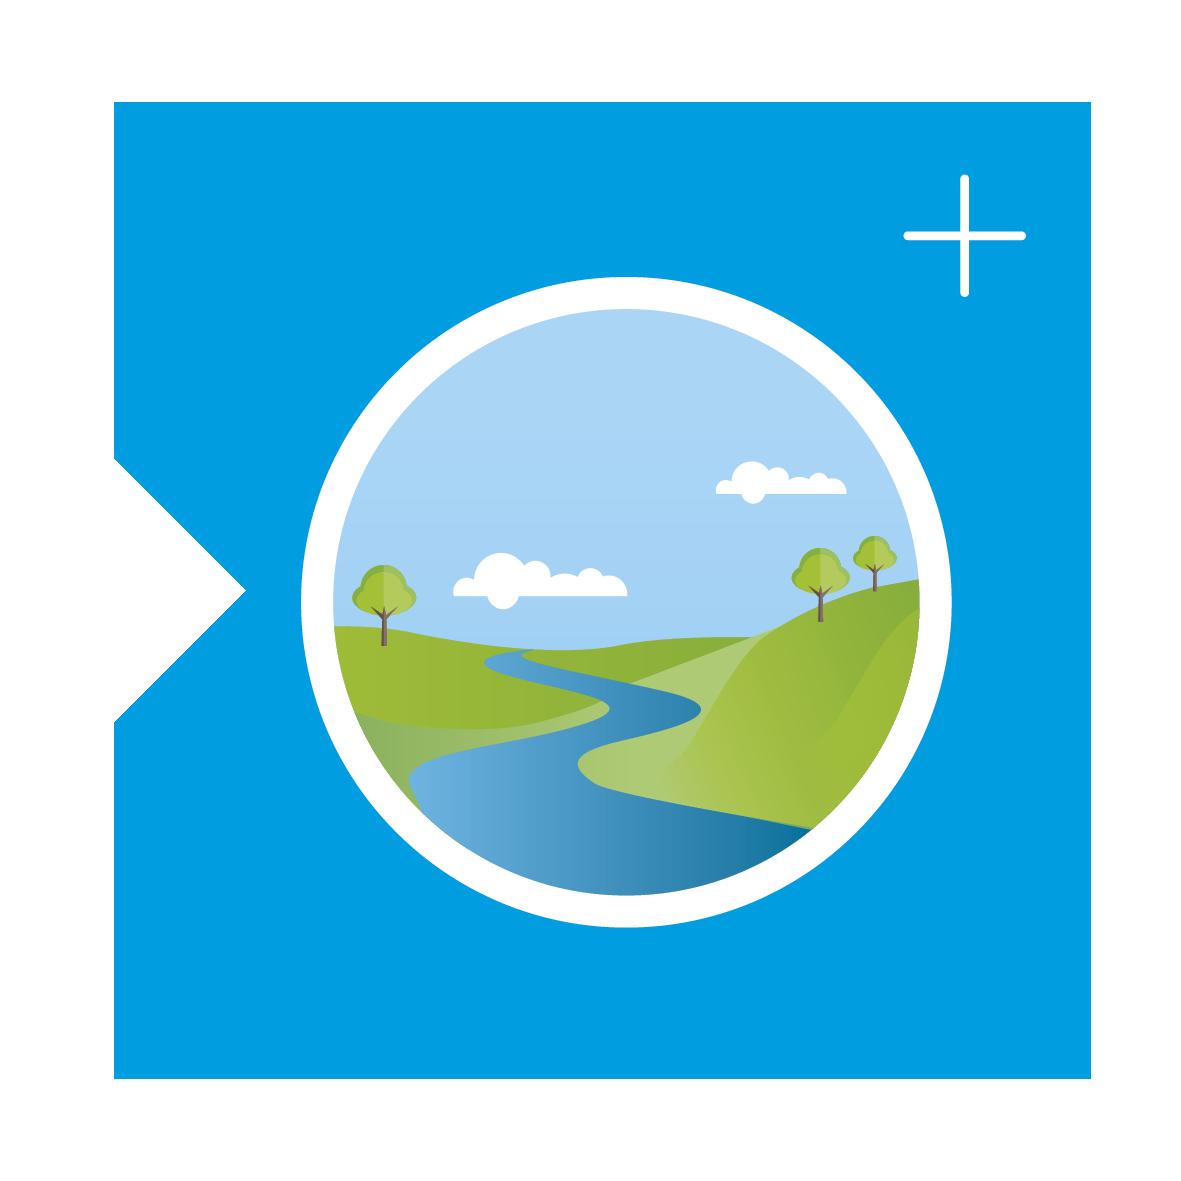 Sauberes Wasser / sauberes Umwelt / clean water / clean environment